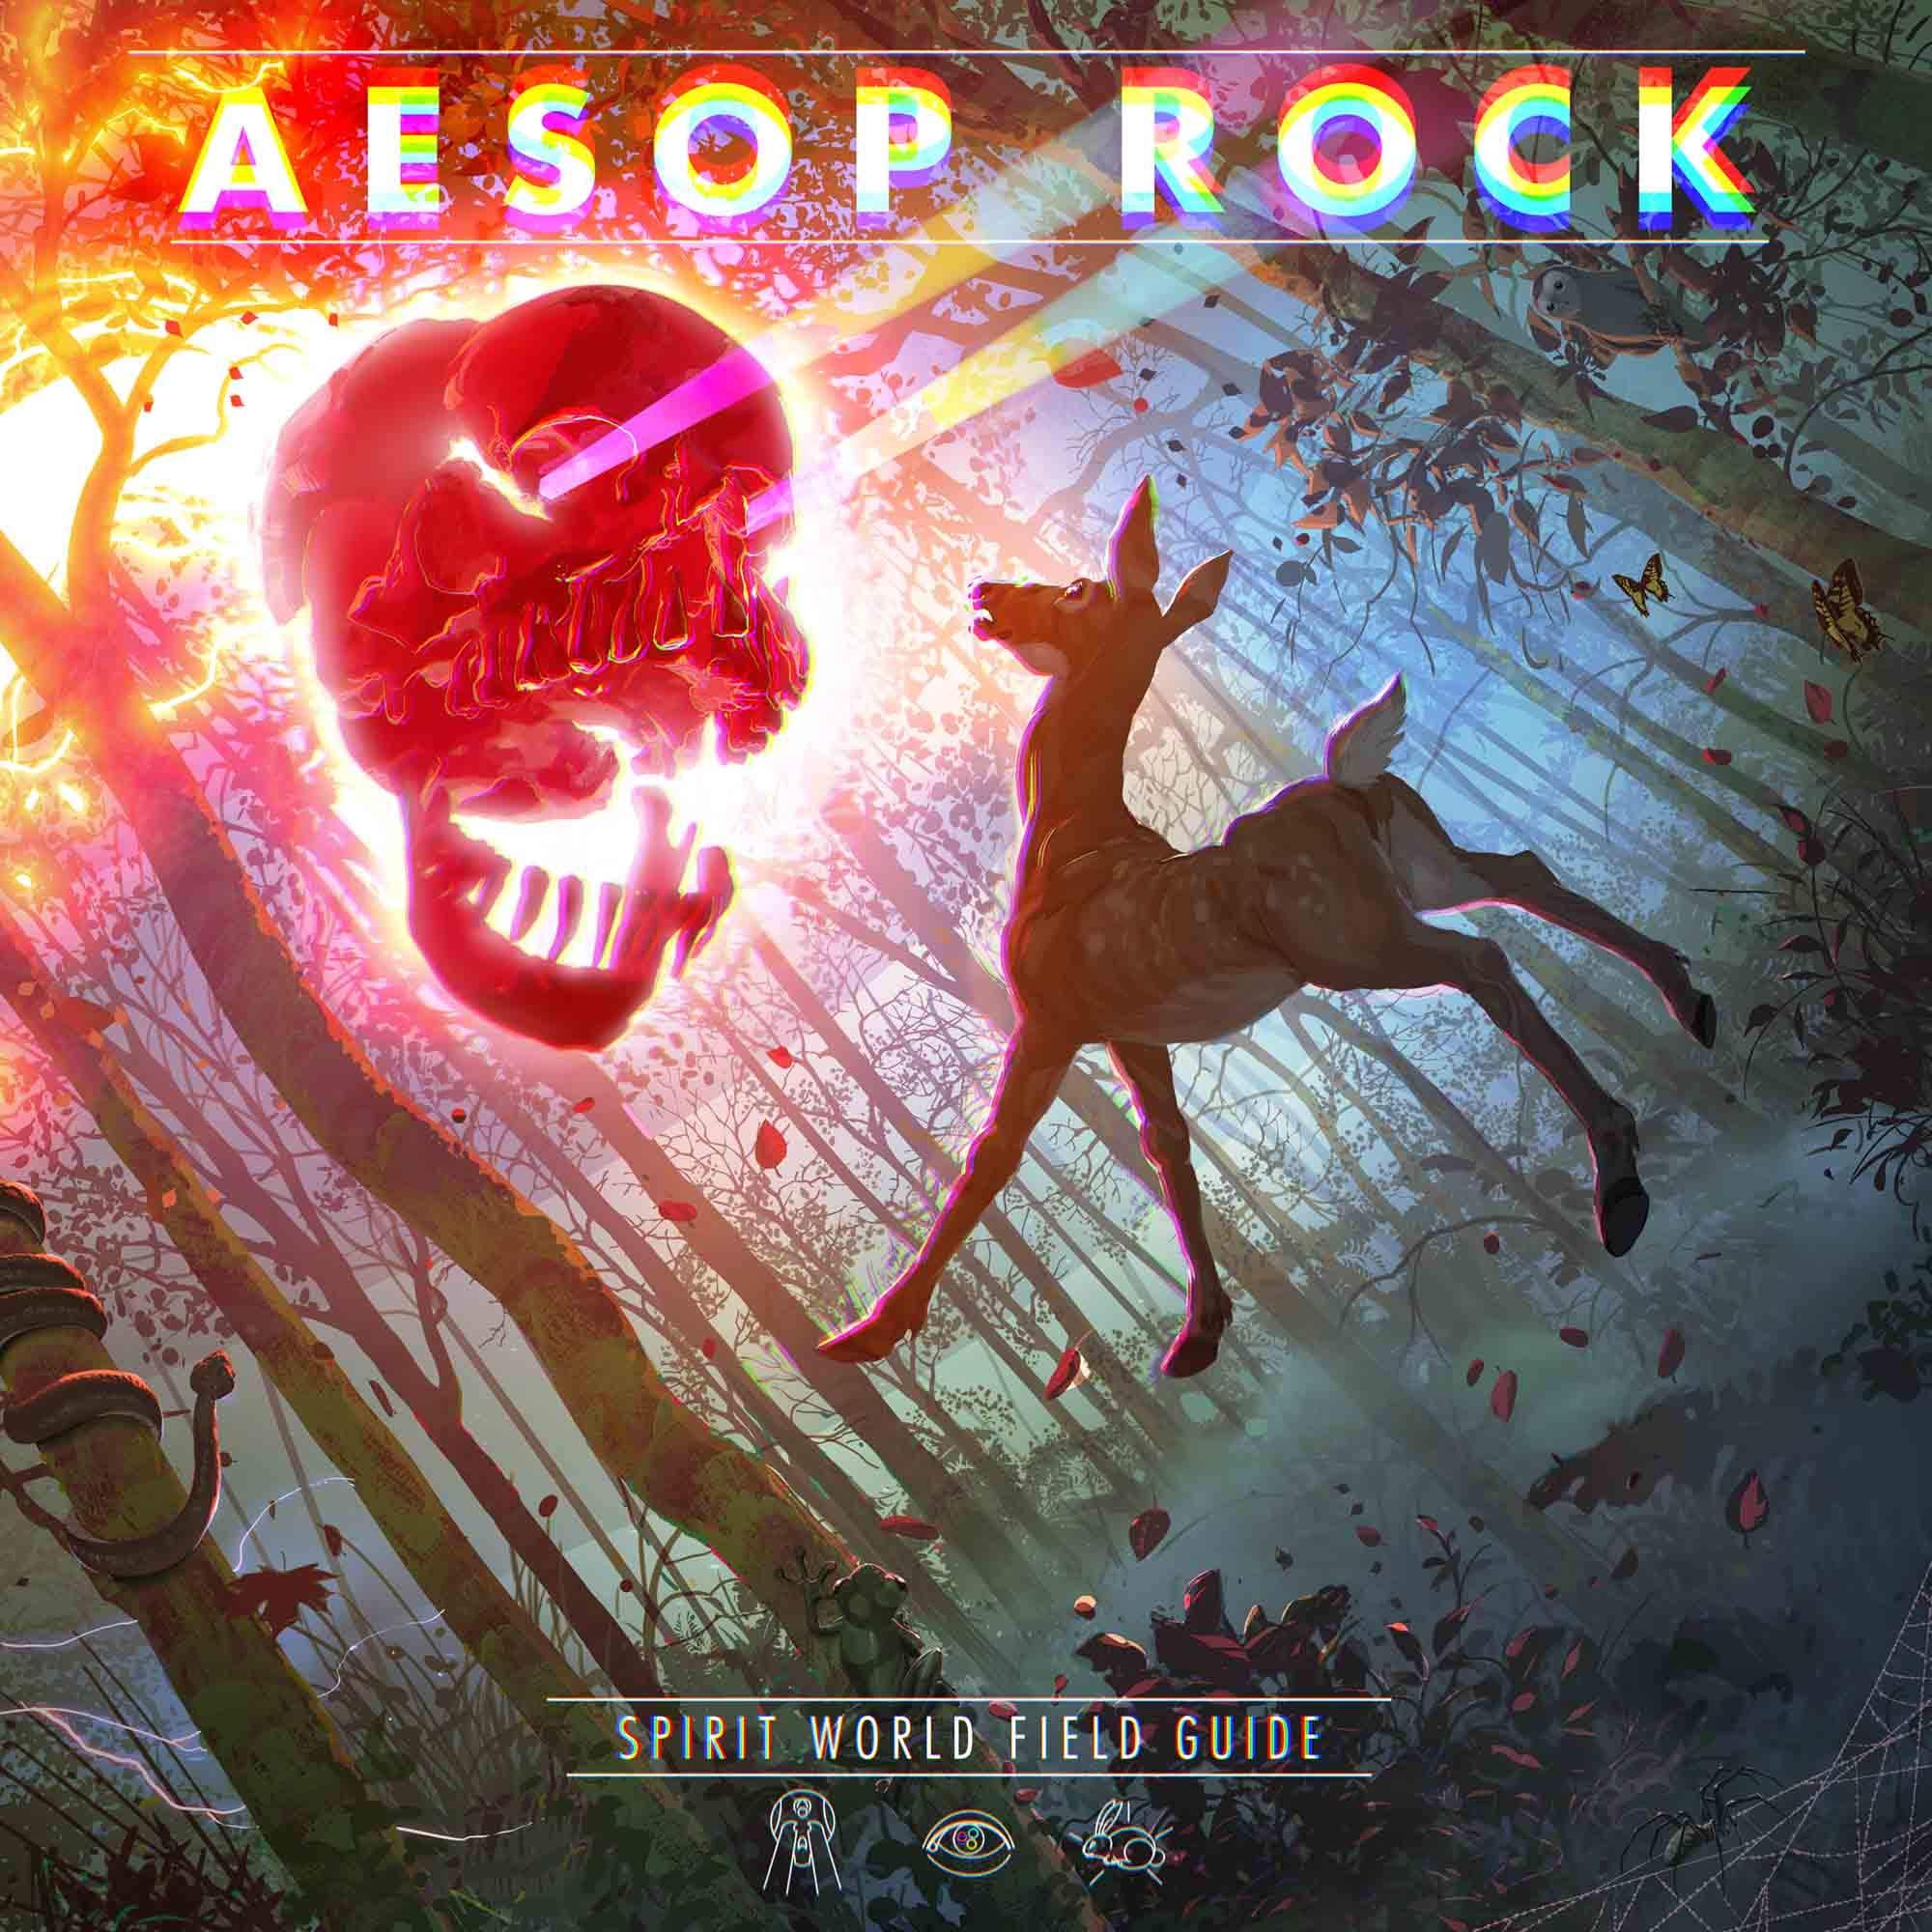 Aesop Rock - Spirit World Field Guide (2020) [FLAC] Download